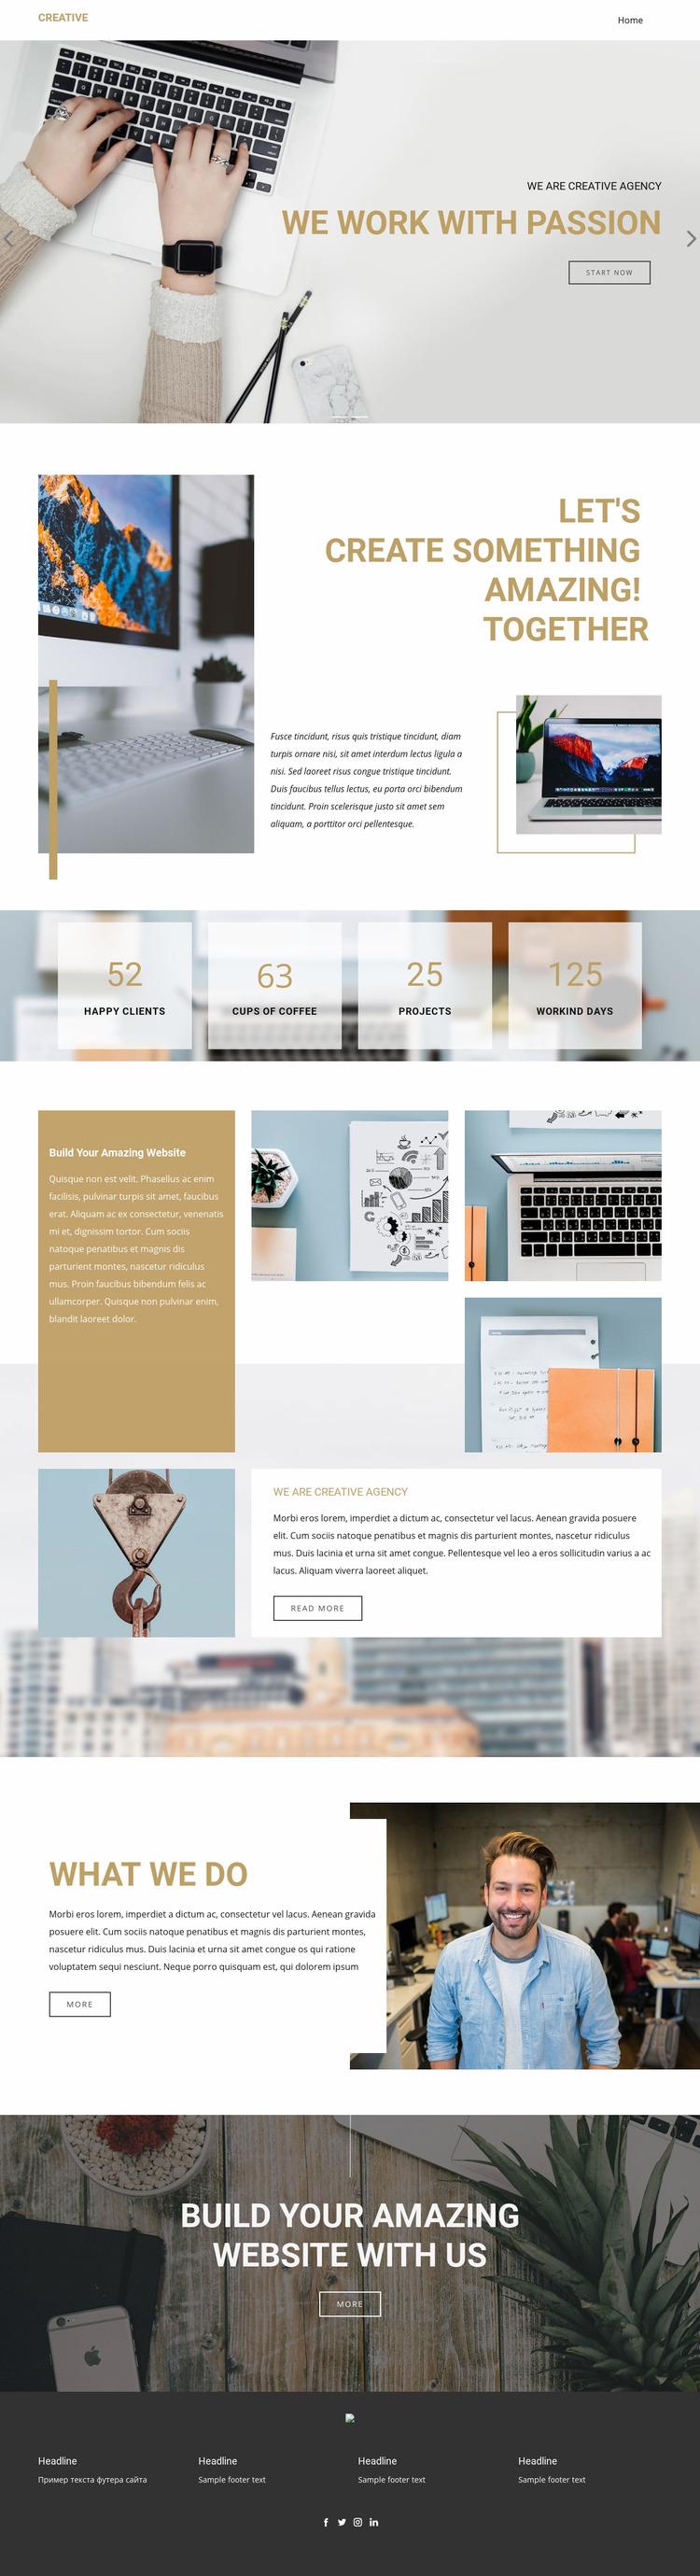 Exceptional creative designs Website Maker